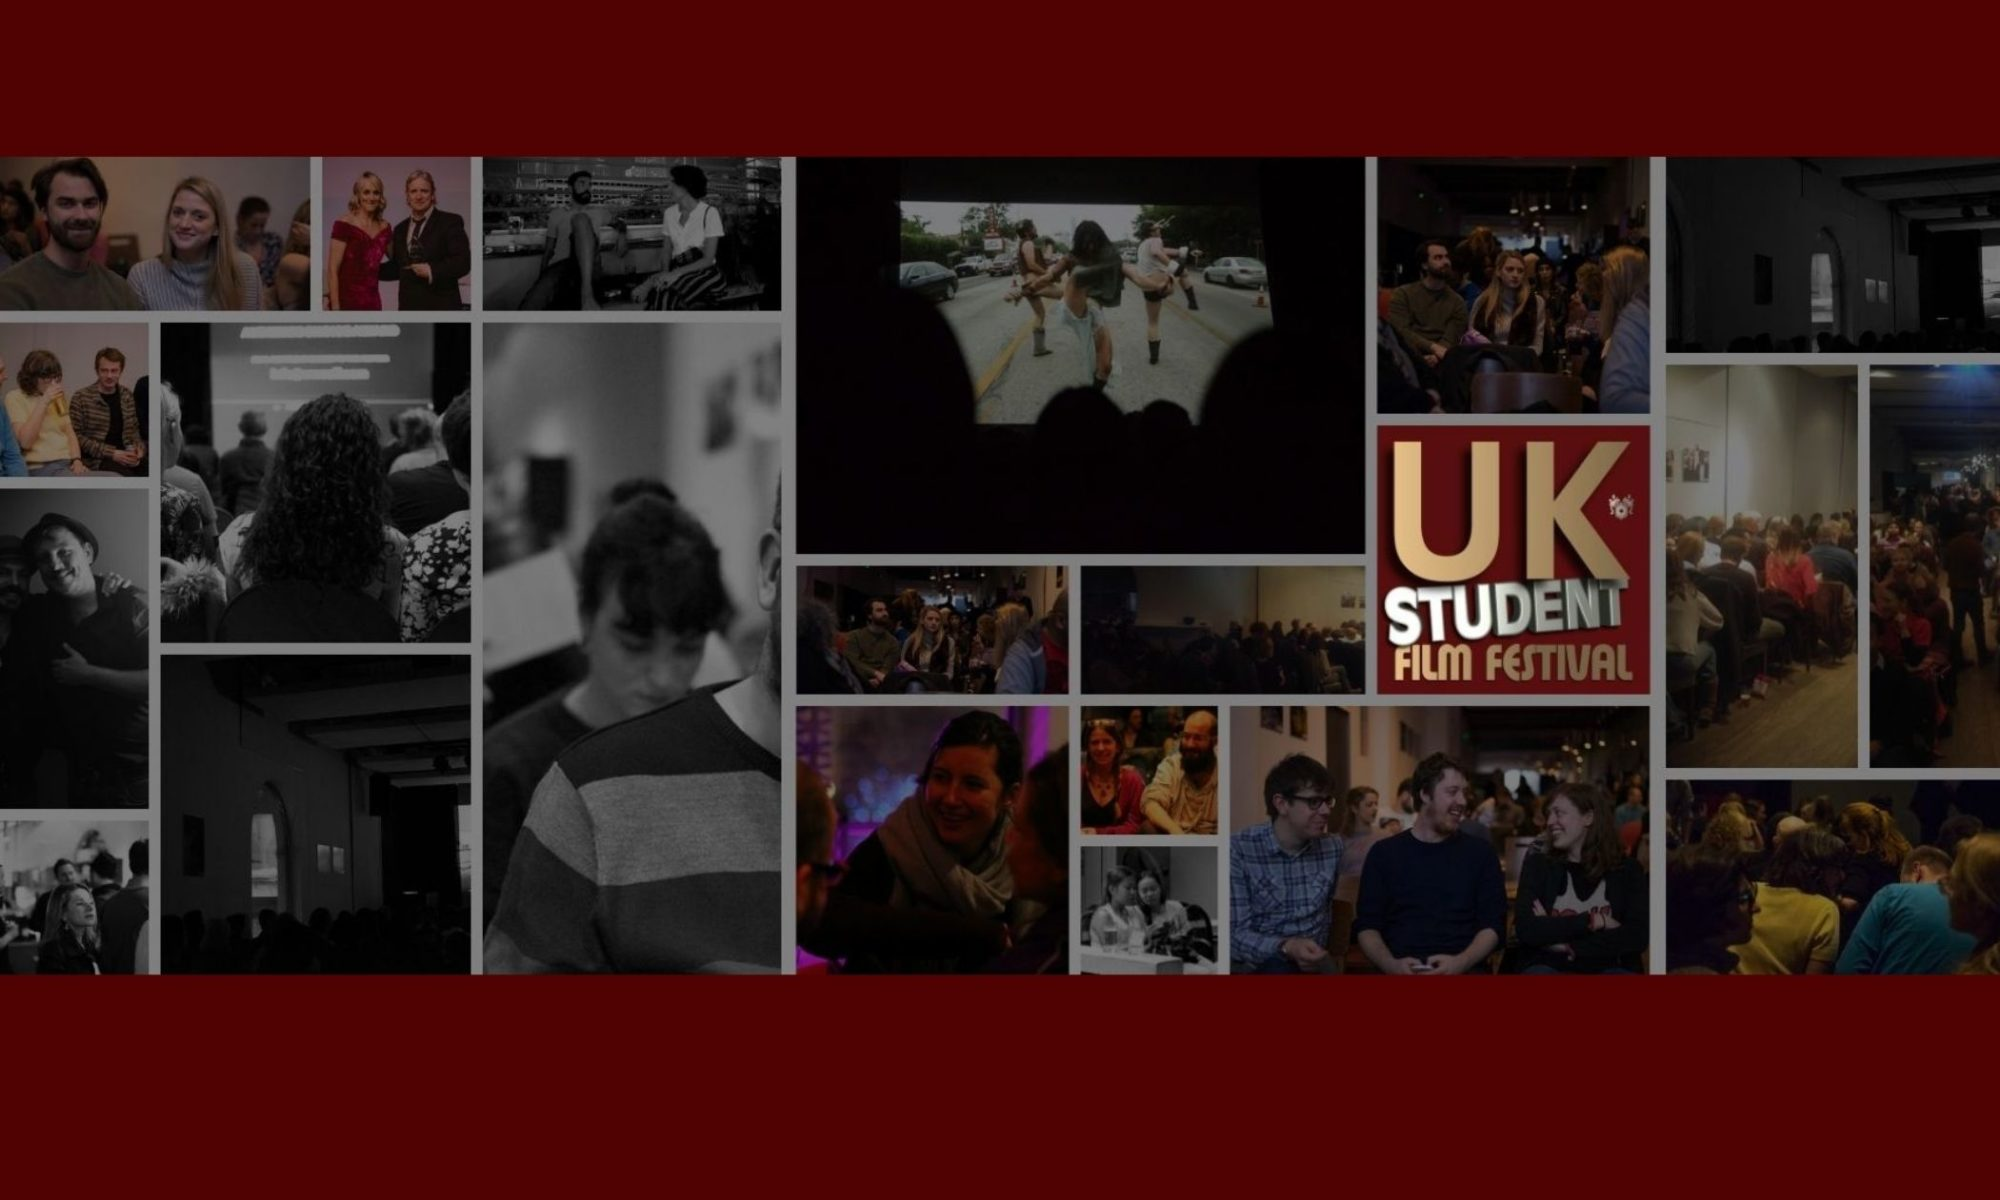 United Kingdom Student Film Festival